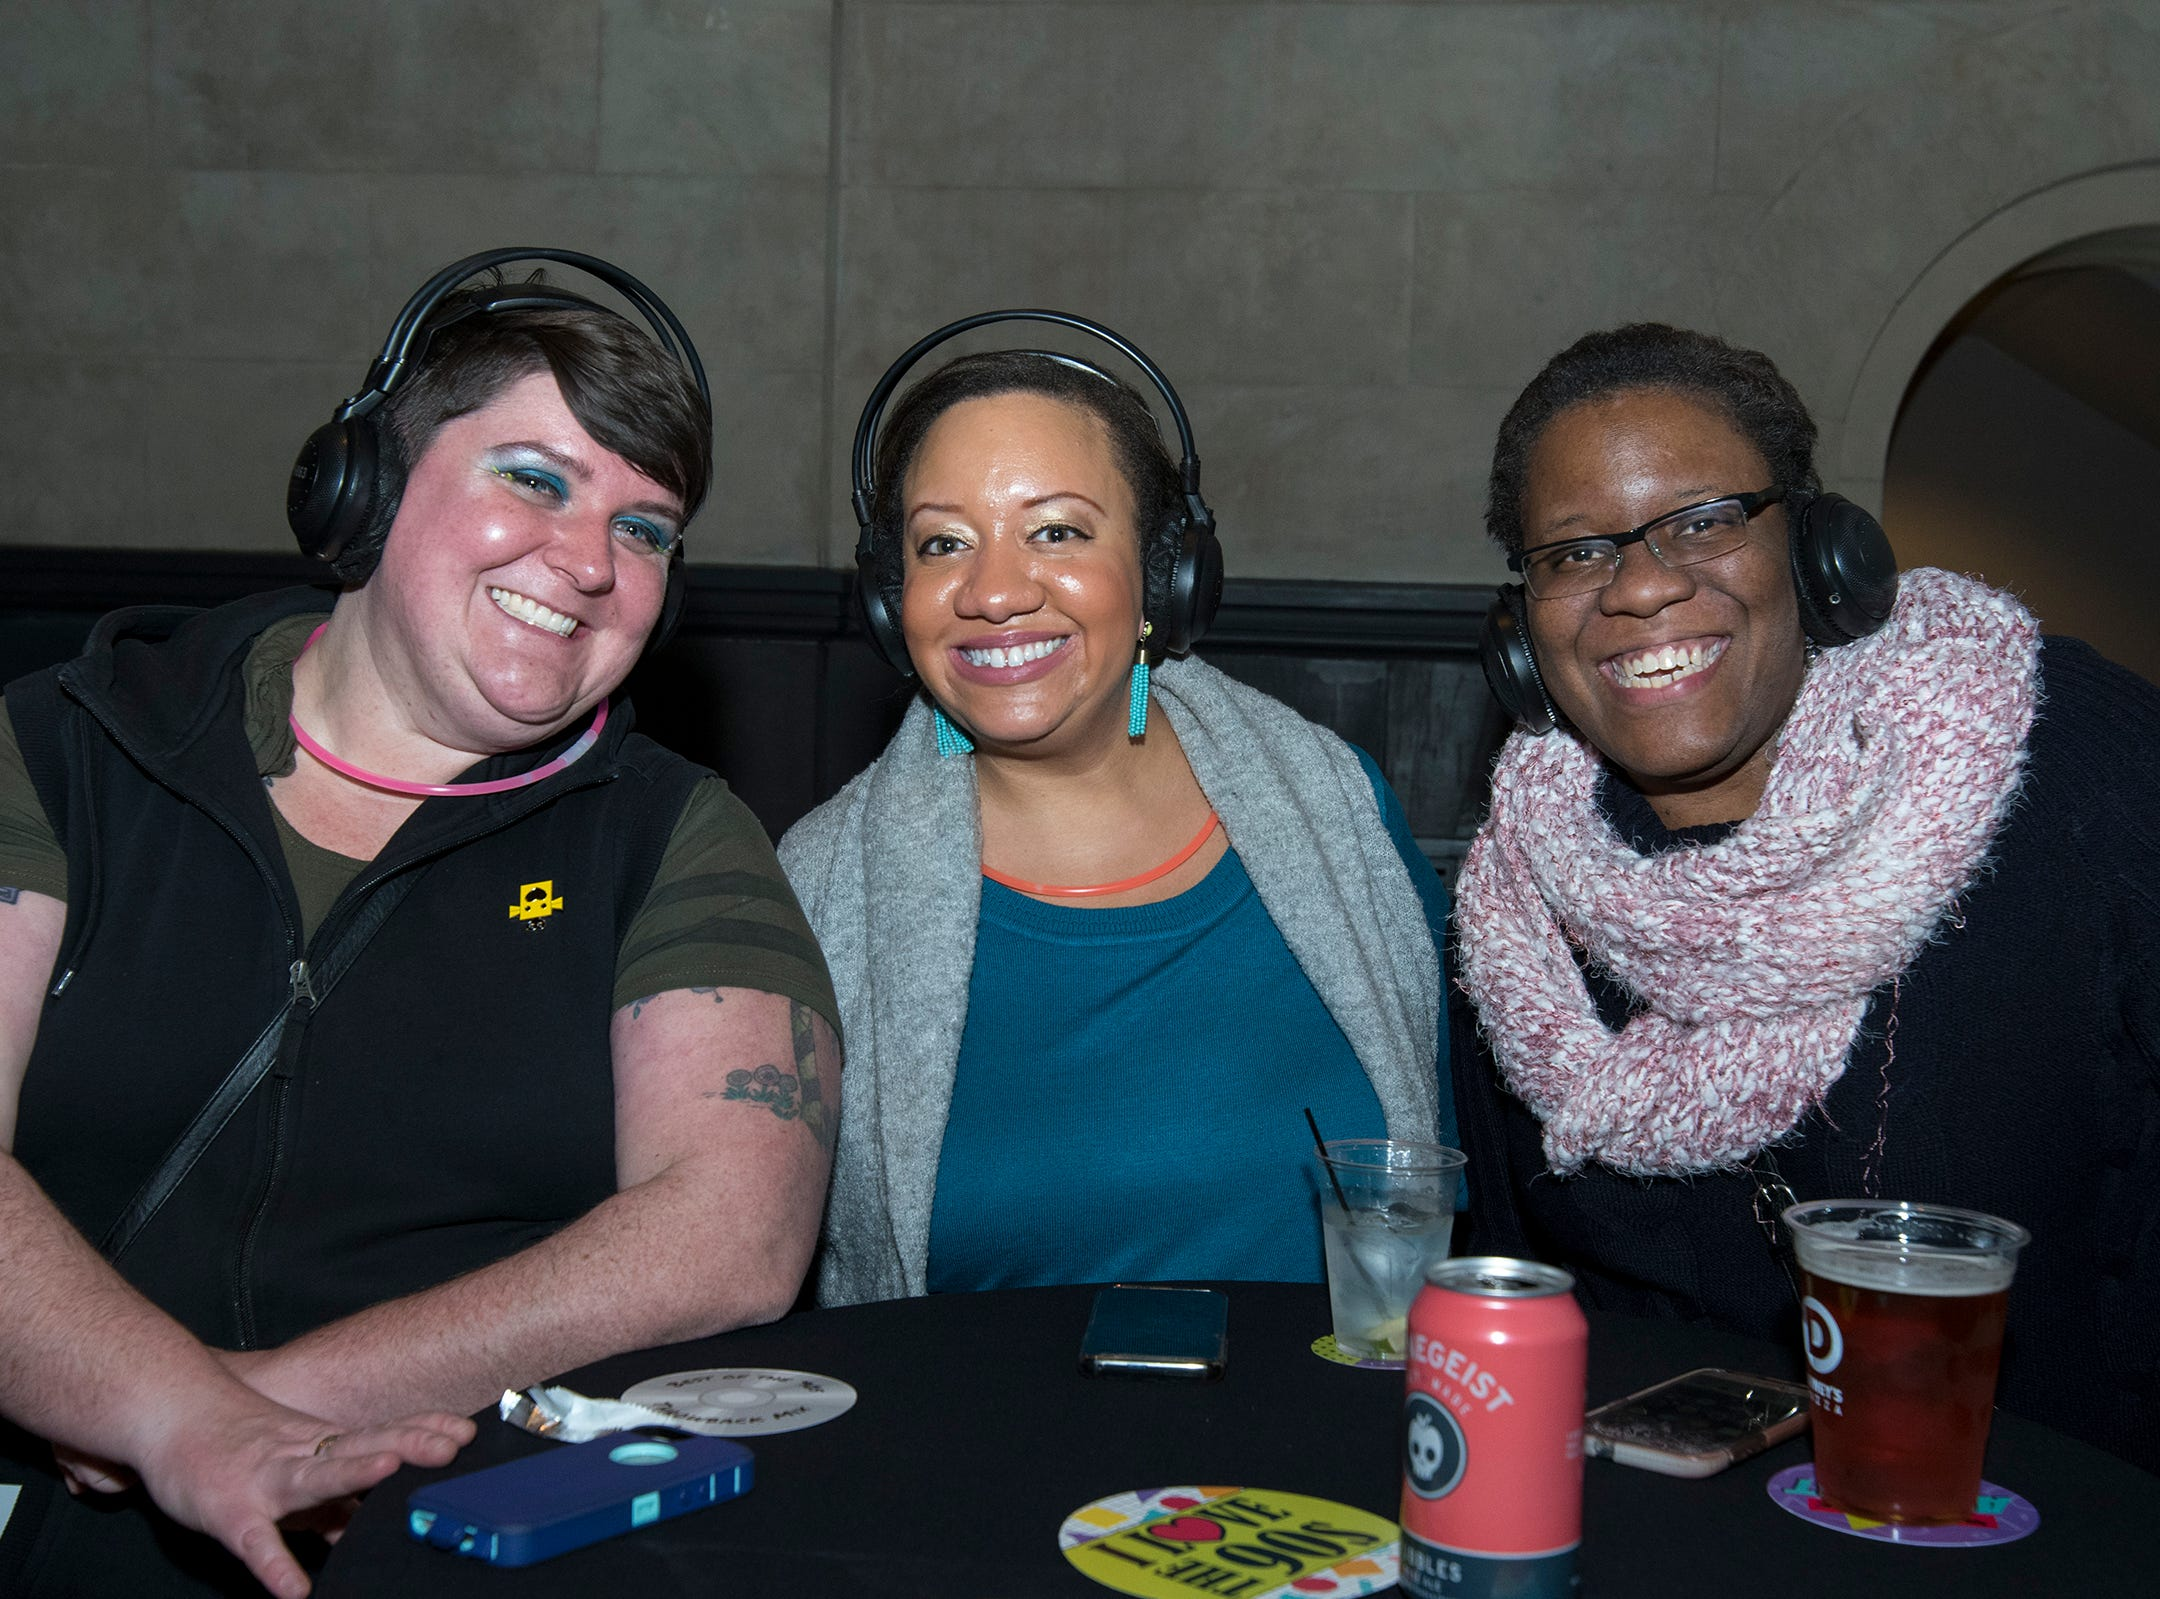 Tina Mahle, Michanne Davis and Alana Calhoun attend a 90s-themed silent disco during Art After Dark at the Cincinnati Art Museum Friday, January 25, 2019 in Cincinnati, Ohio.